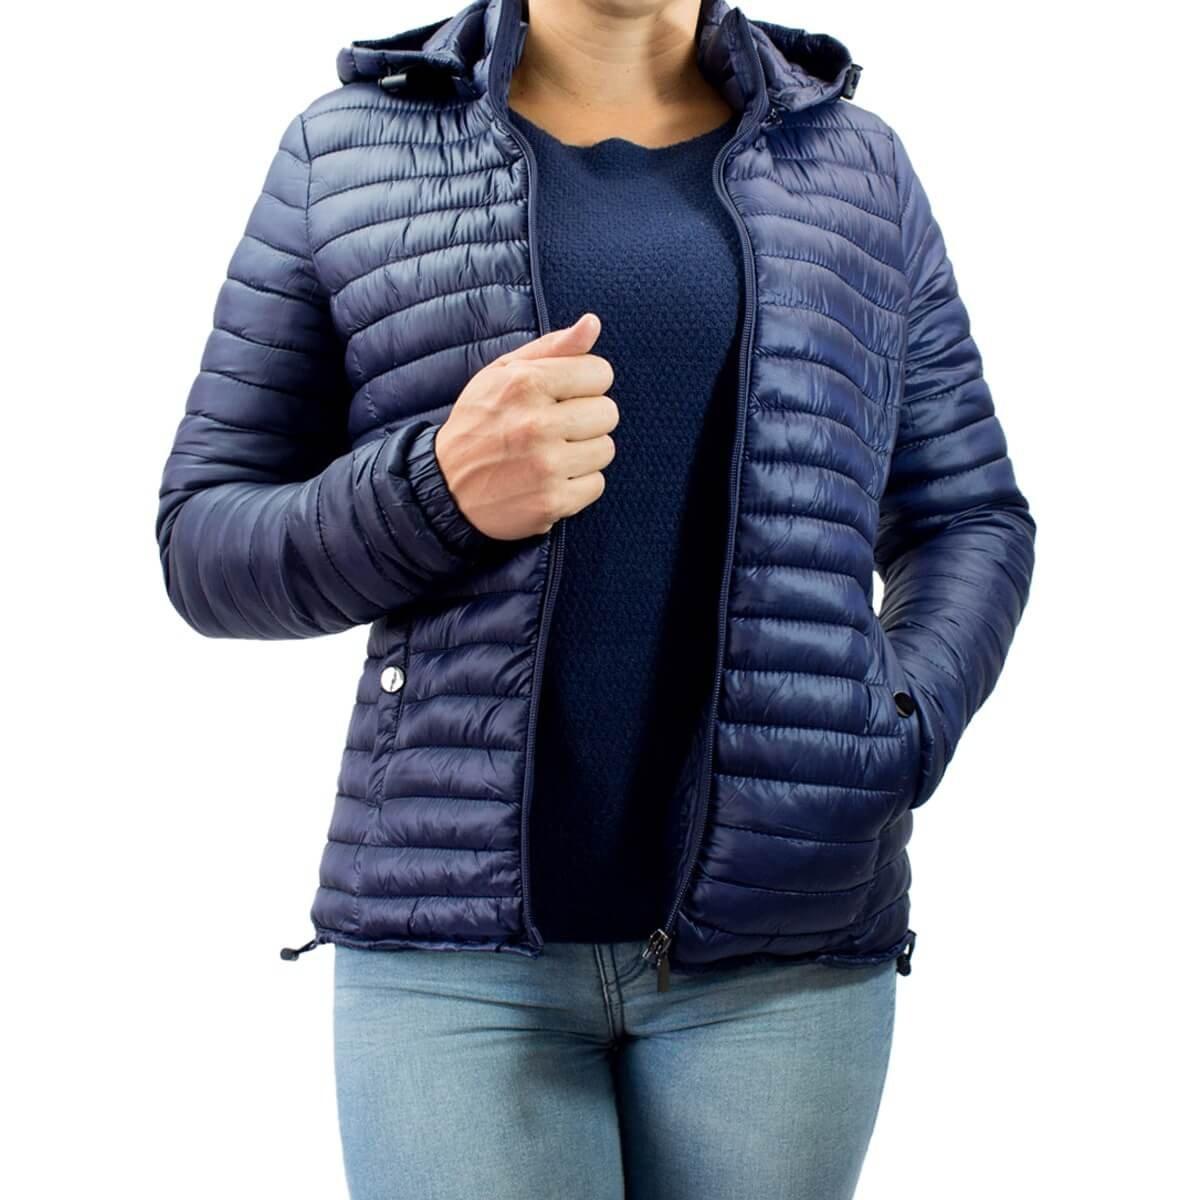 5622f5e4a Bizz Store - Jaqueta Feminina Facinelli Nylon Com Capuz